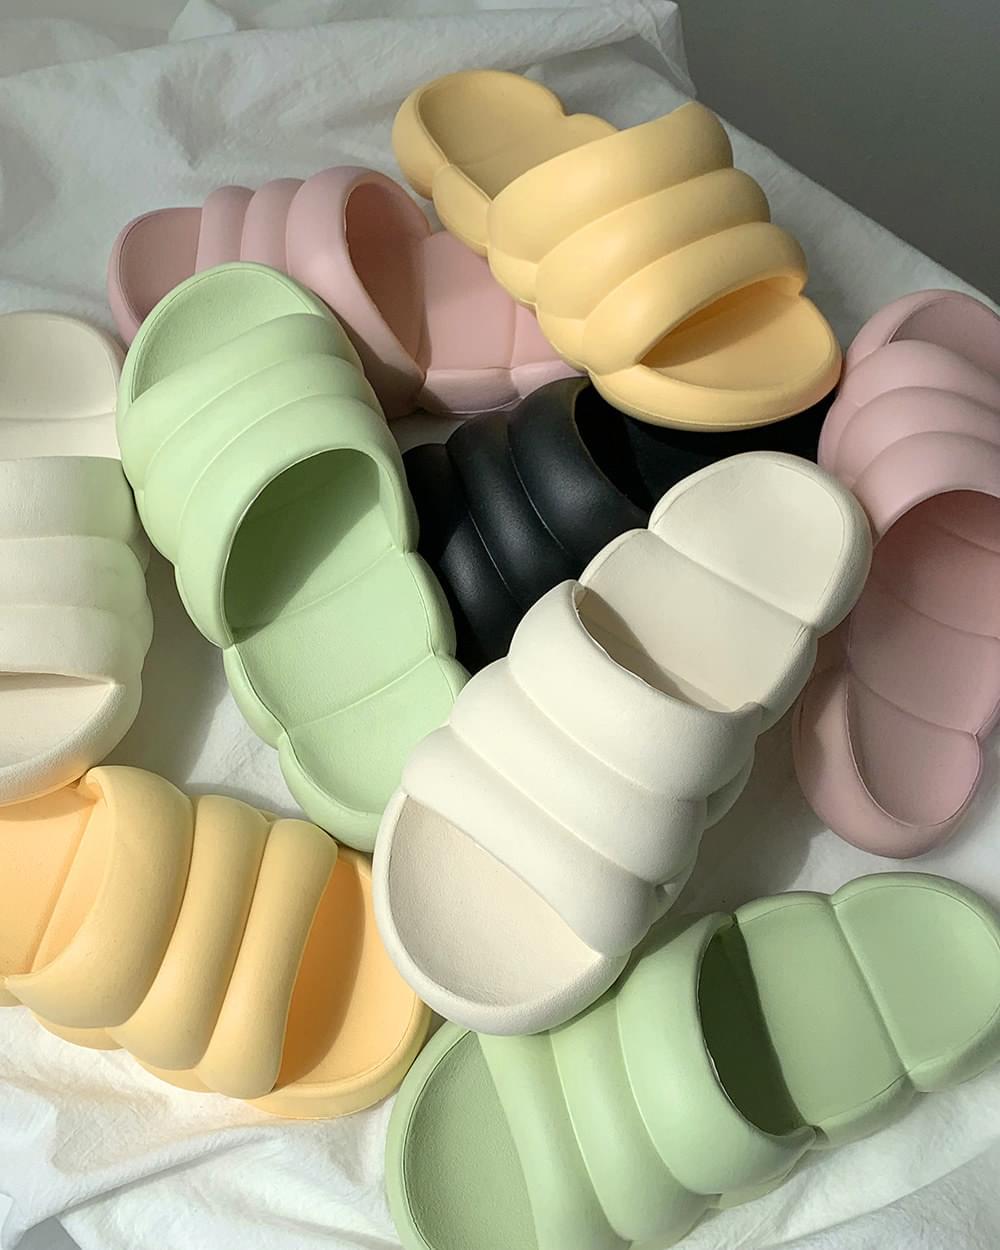 Pastel cloud slippers